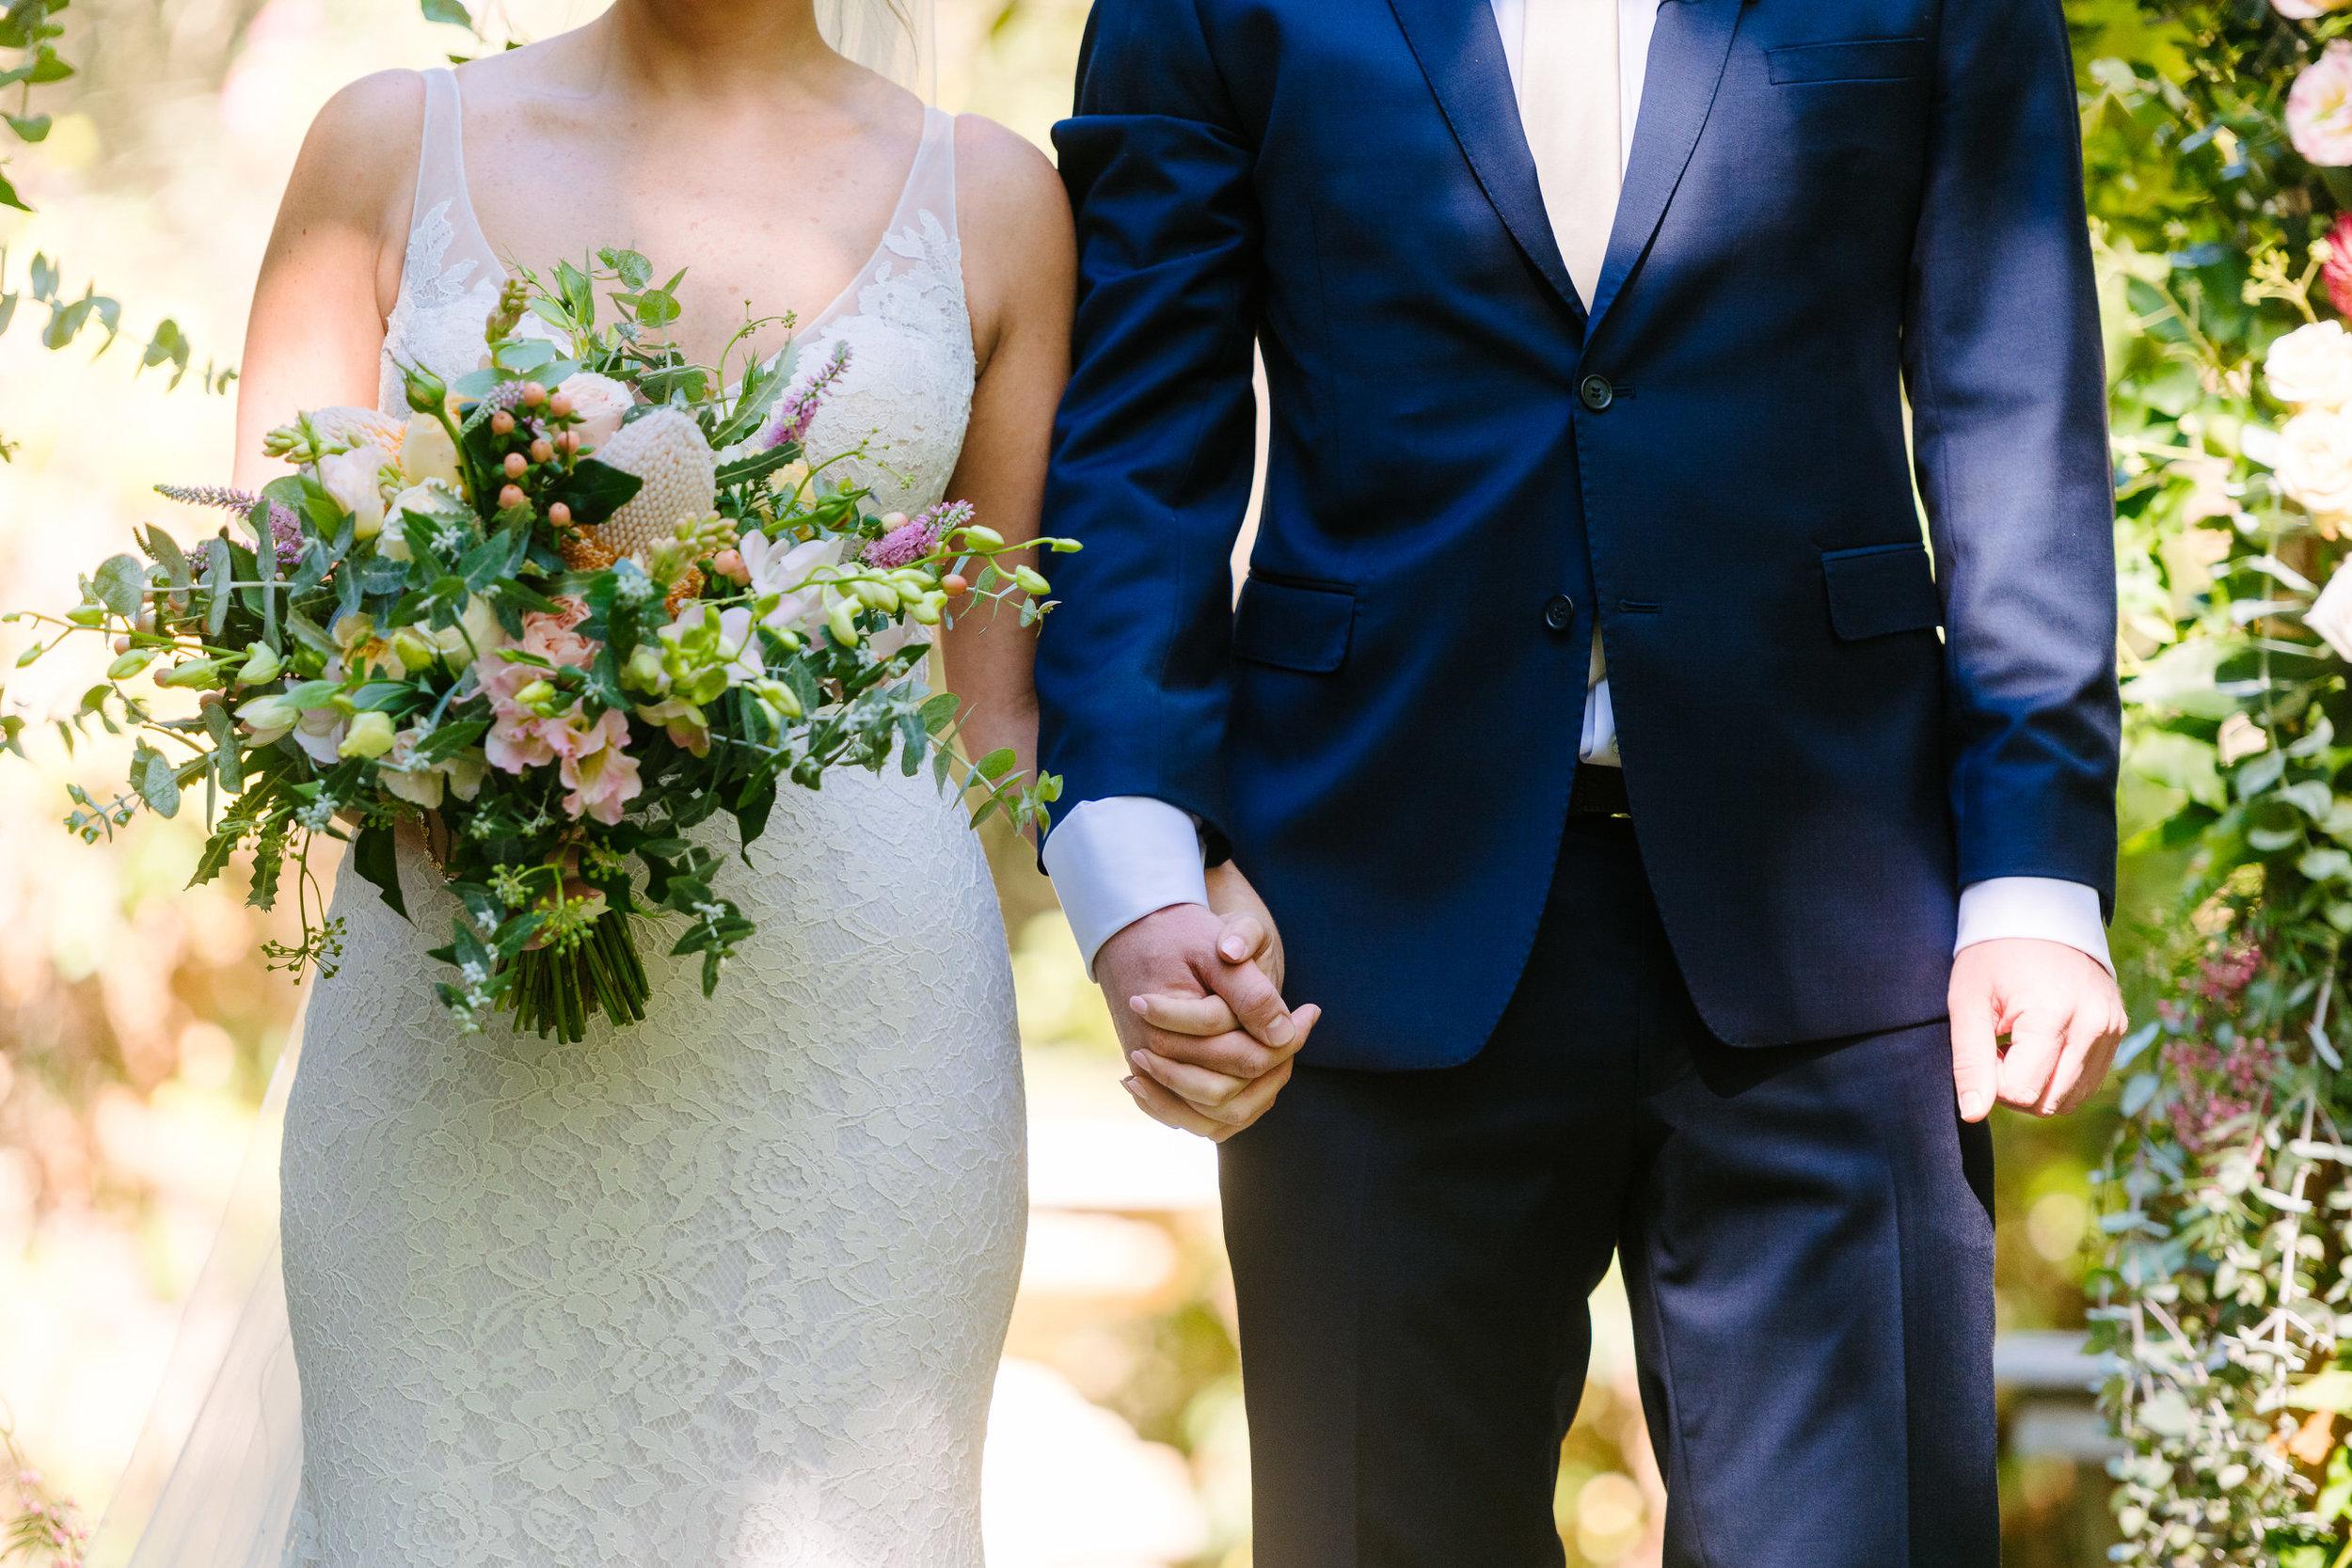 Justin_And_Jim_Photography_Chateau_Dore_Bendigo_Wedding34.JPG